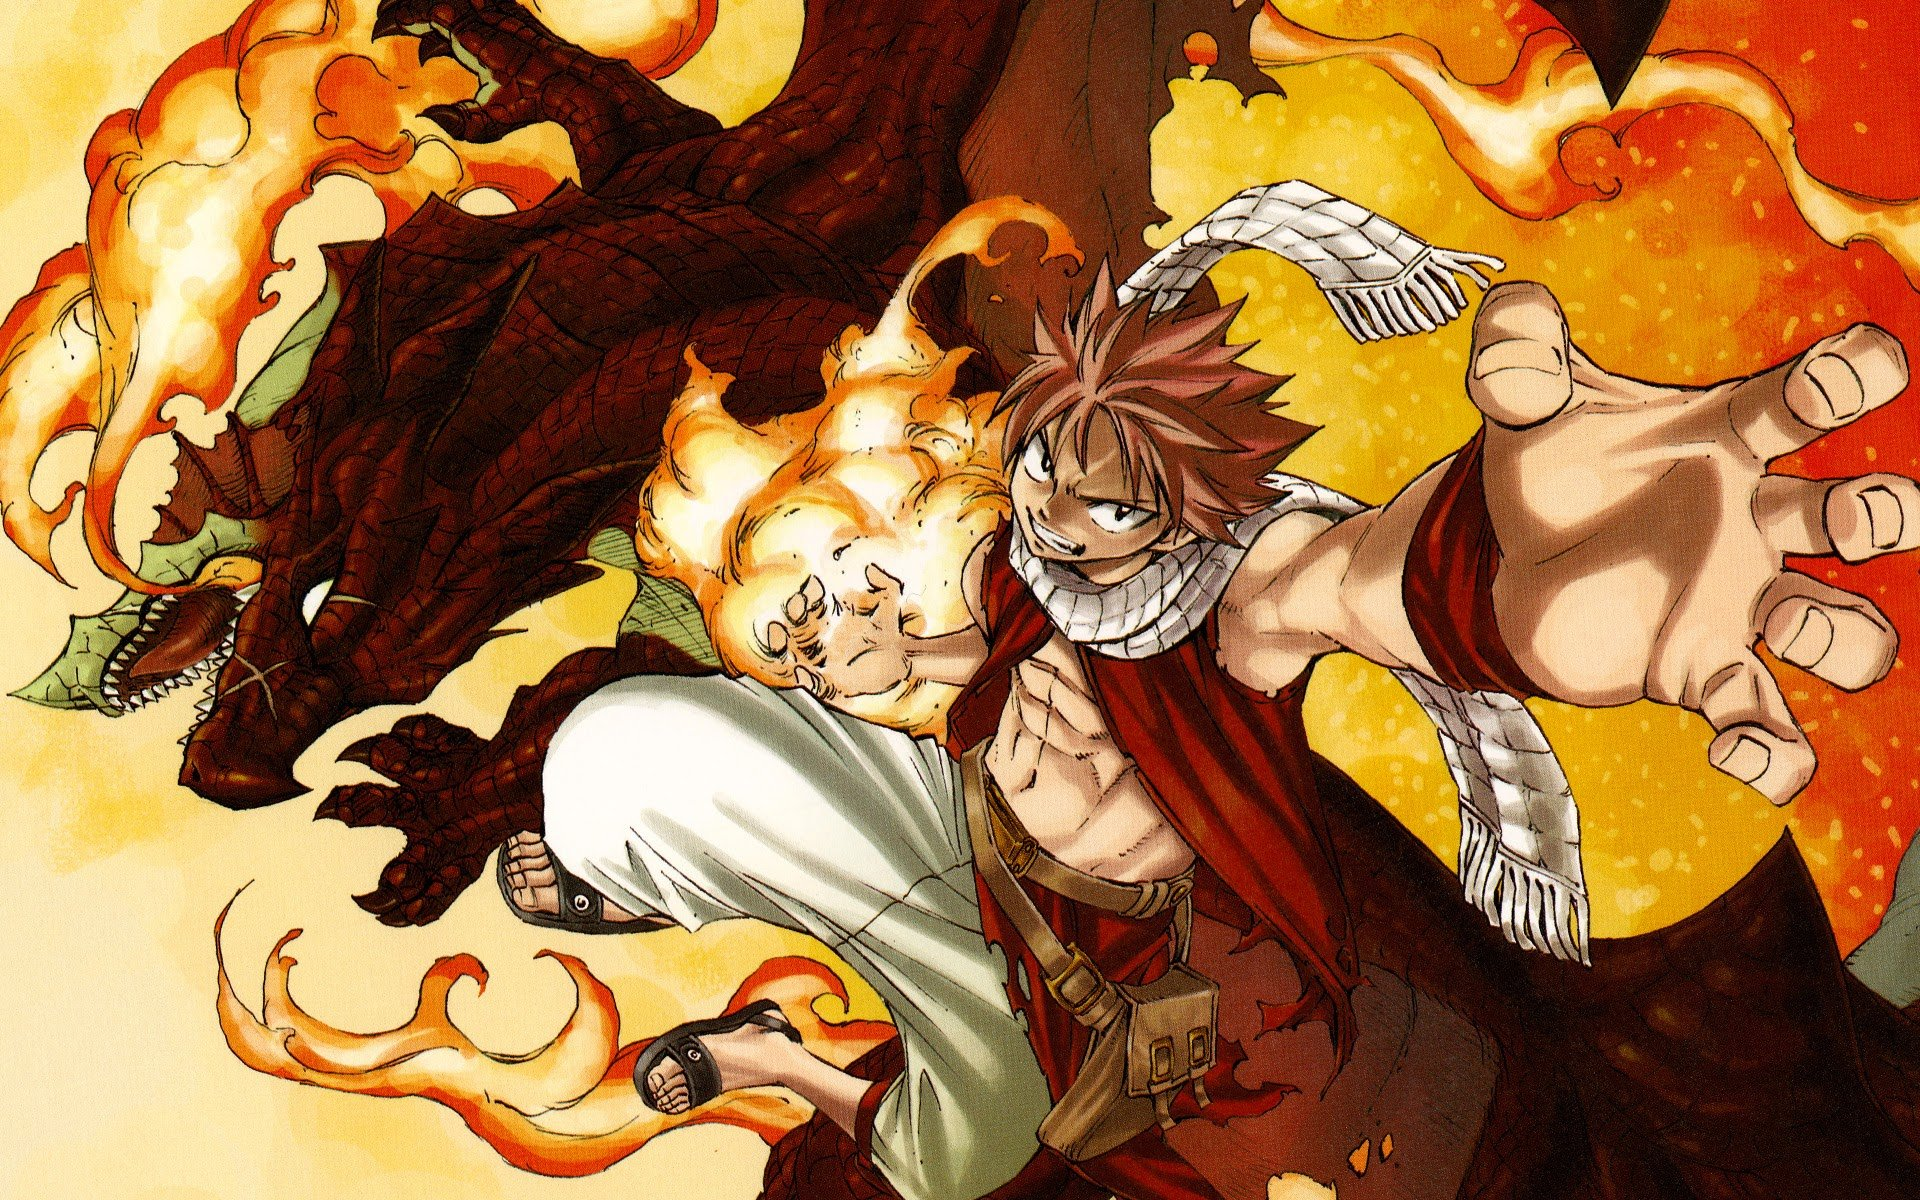 natsu dragneel igneel fire dragon fairy tail anime hd wallpaper 1920x1200